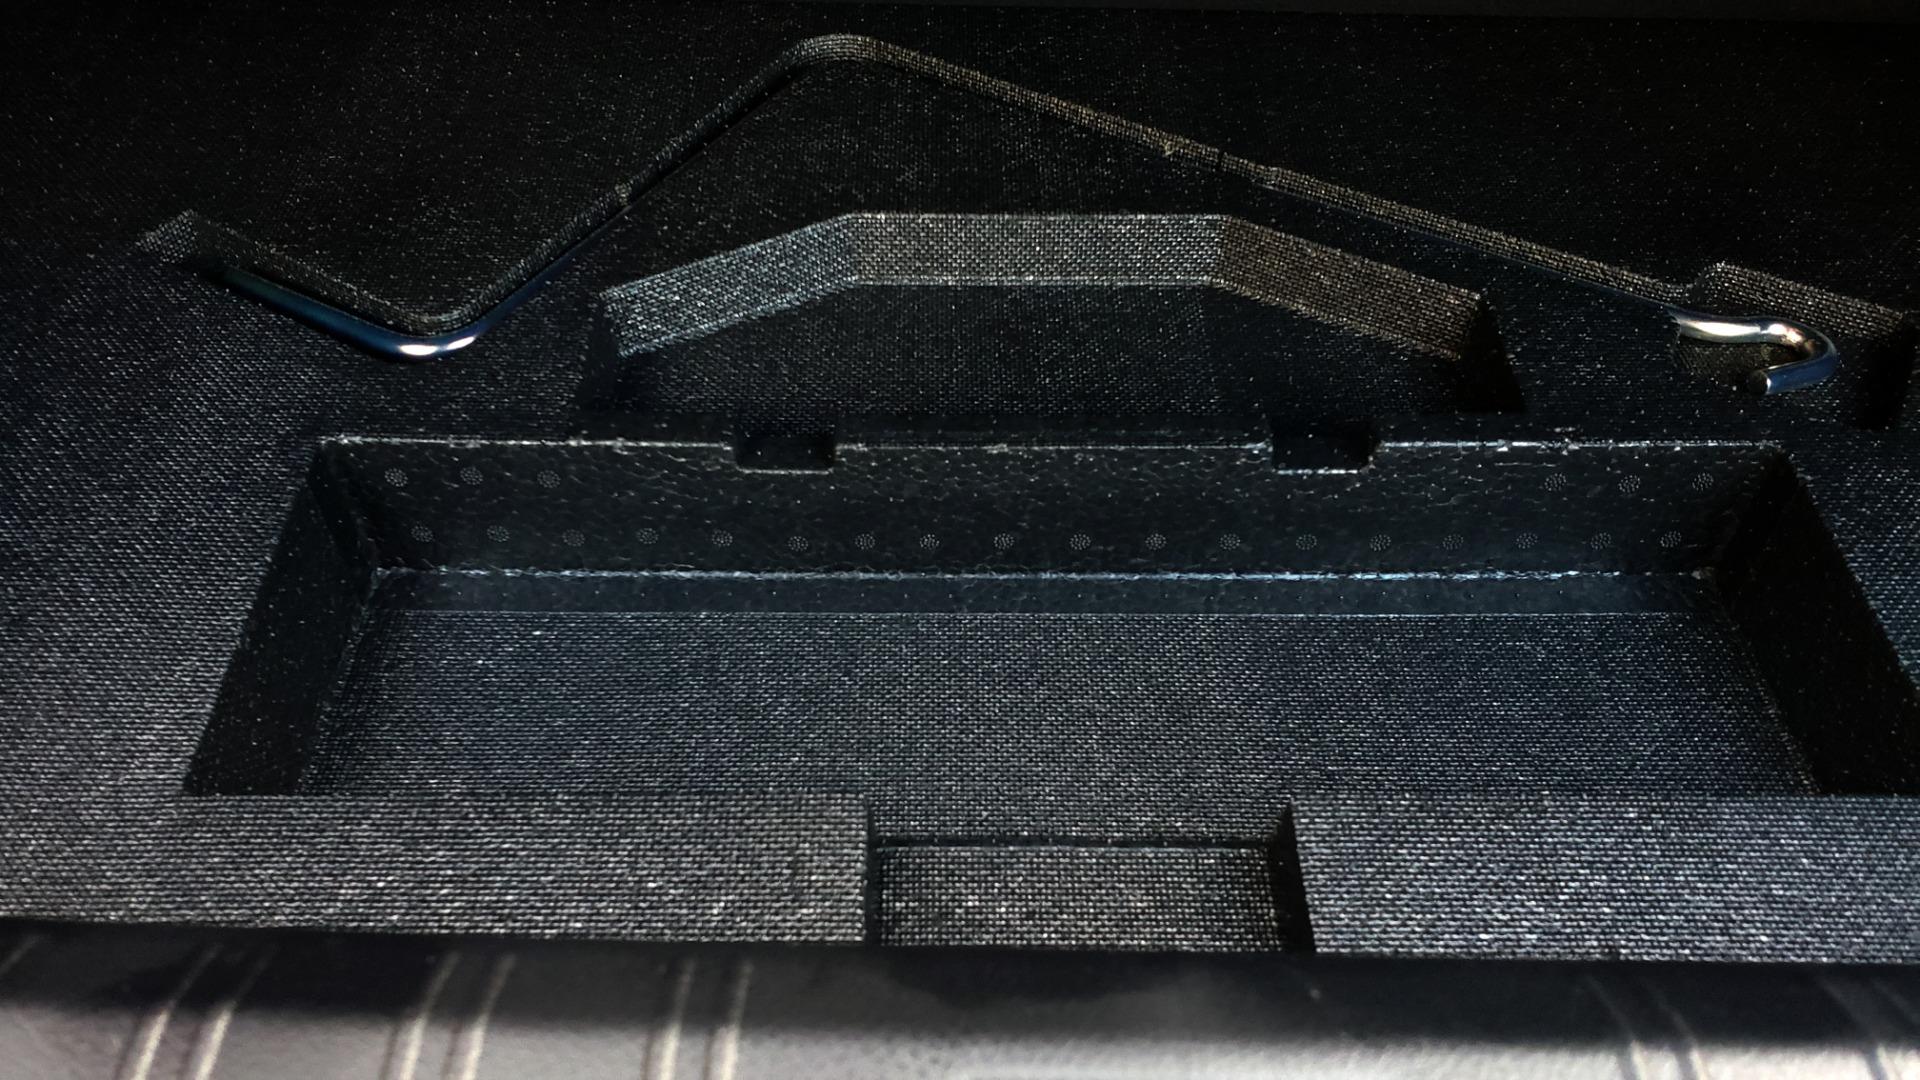 Used 2020 Subaru WRX STI 2.5L TURBO / 6-SPEED MANUAL / RECARO SEATS / REARVIEW for sale Sold at Formula Imports in Charlotte NC 28227 24